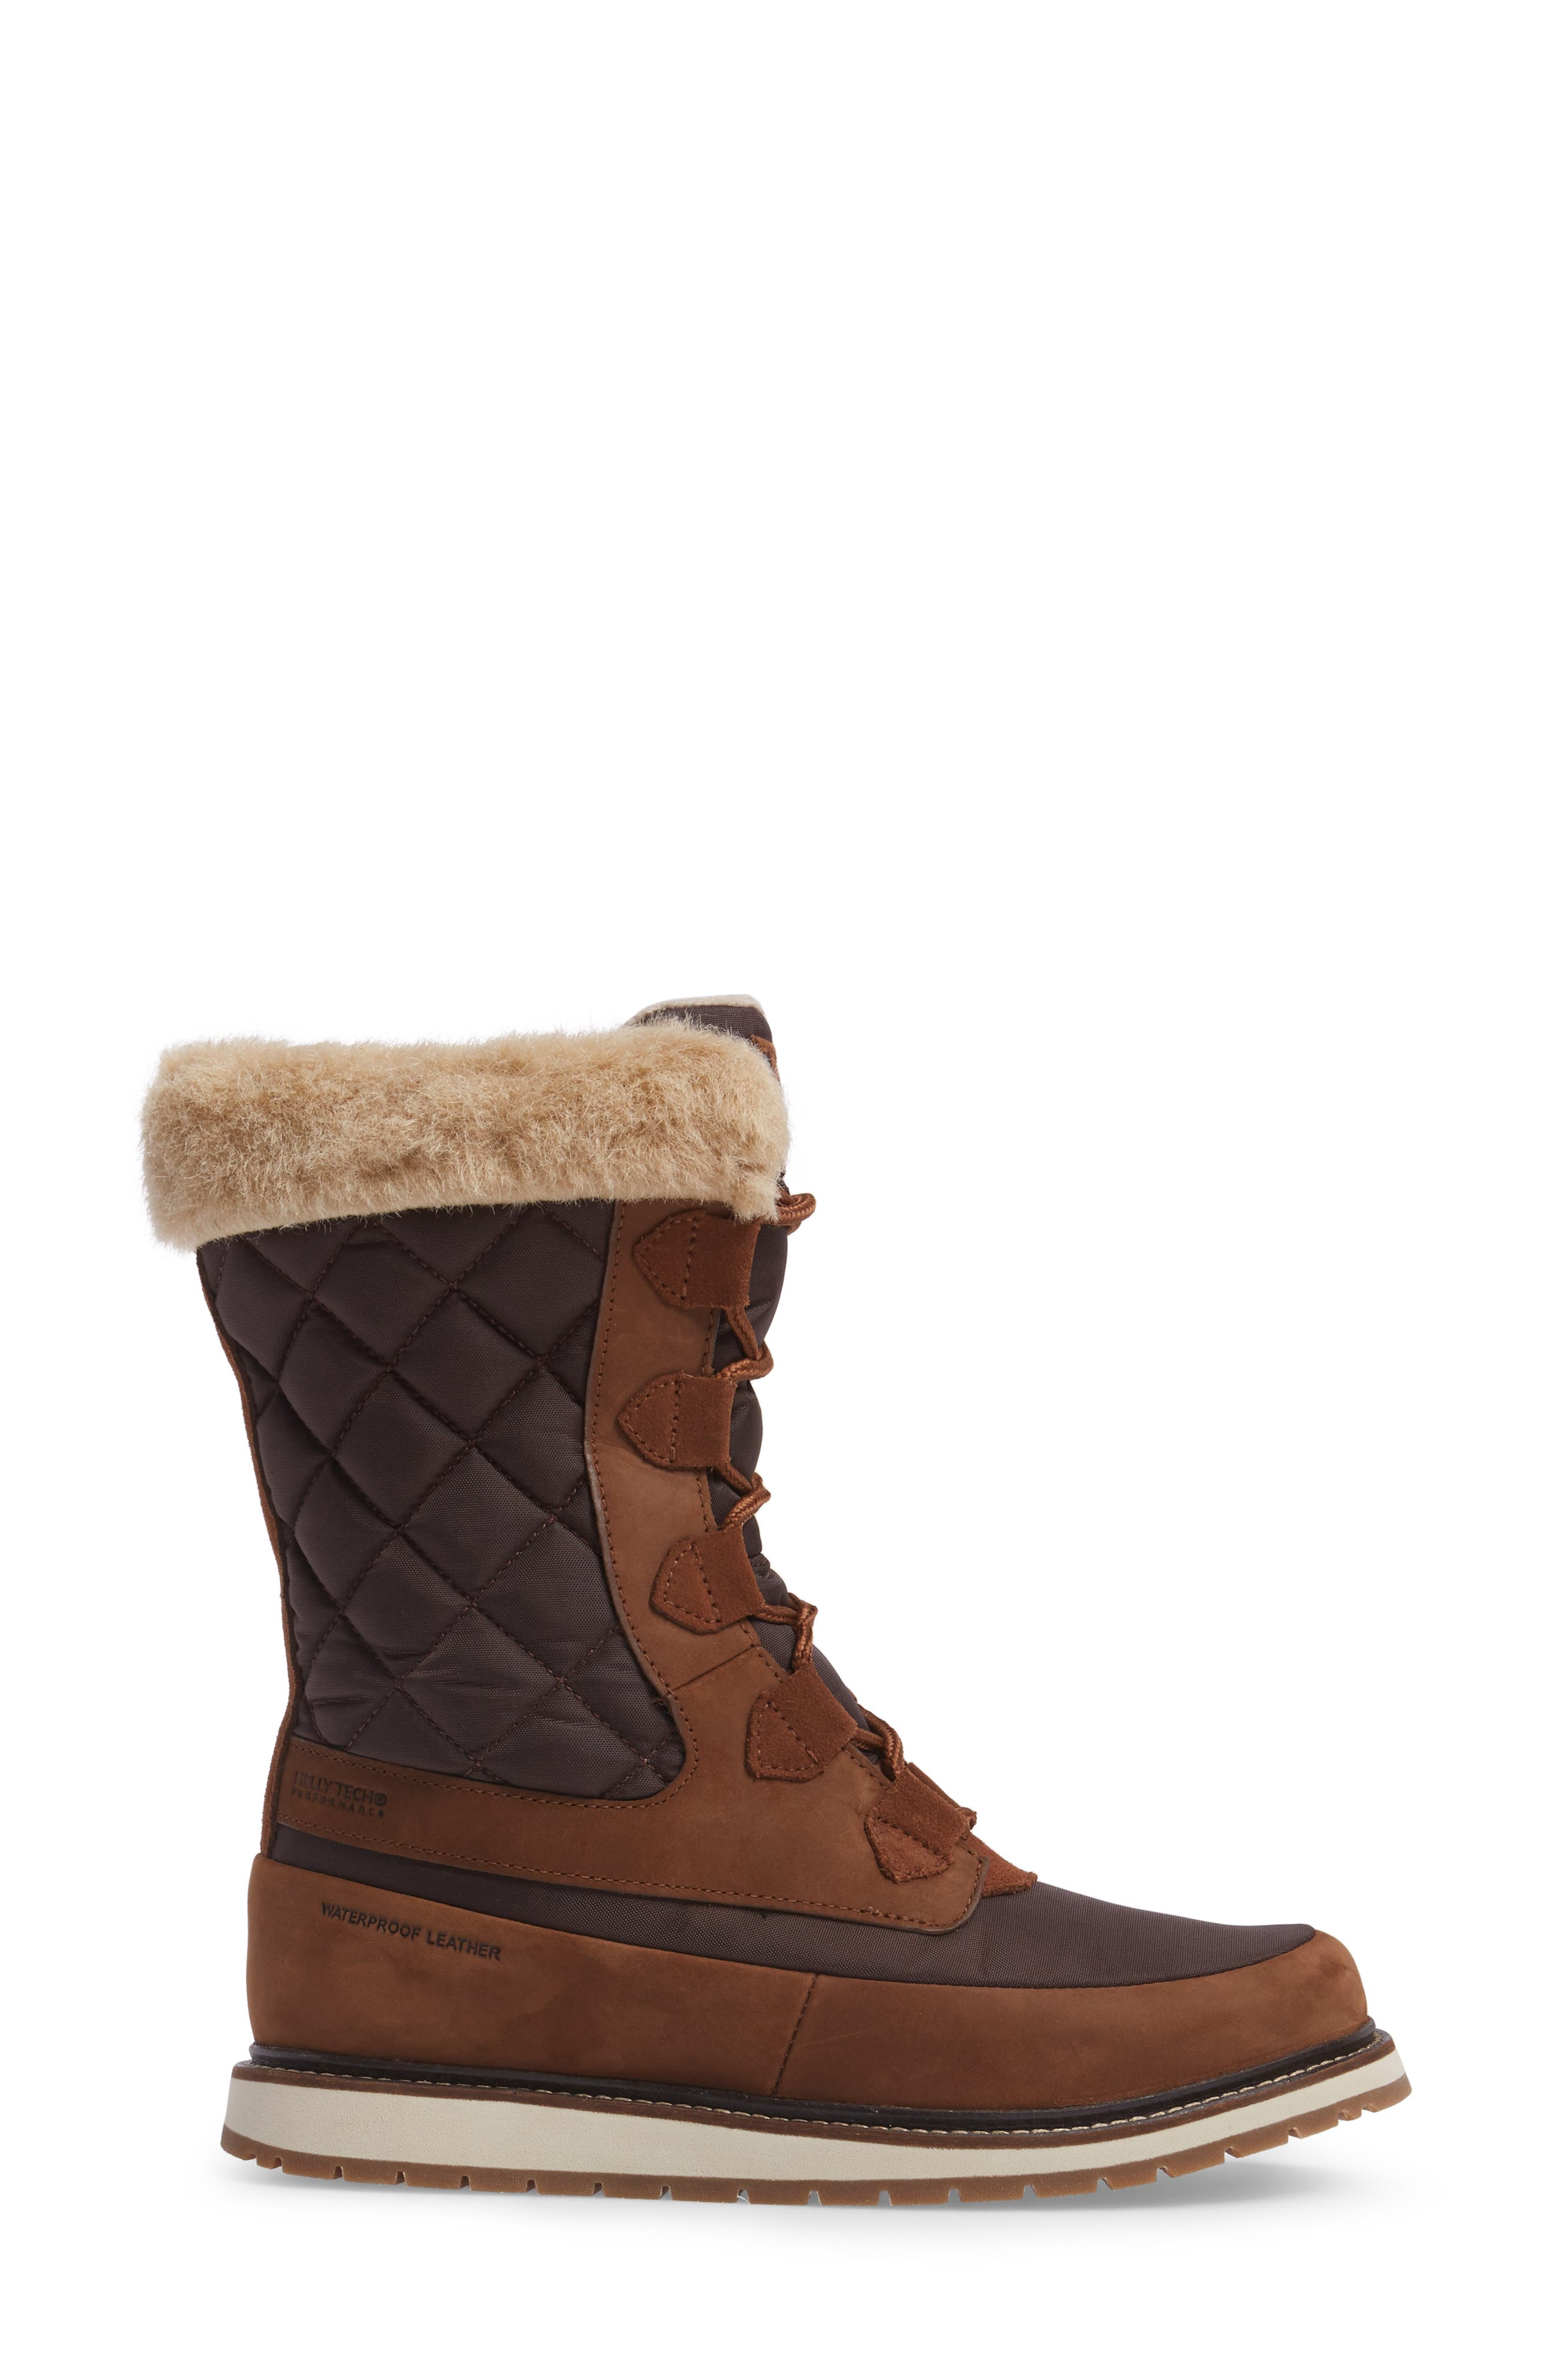 Alternate Image 3  - Helly Hansen Arosa Waterproof Boot with Faux Fur Trim (Women)